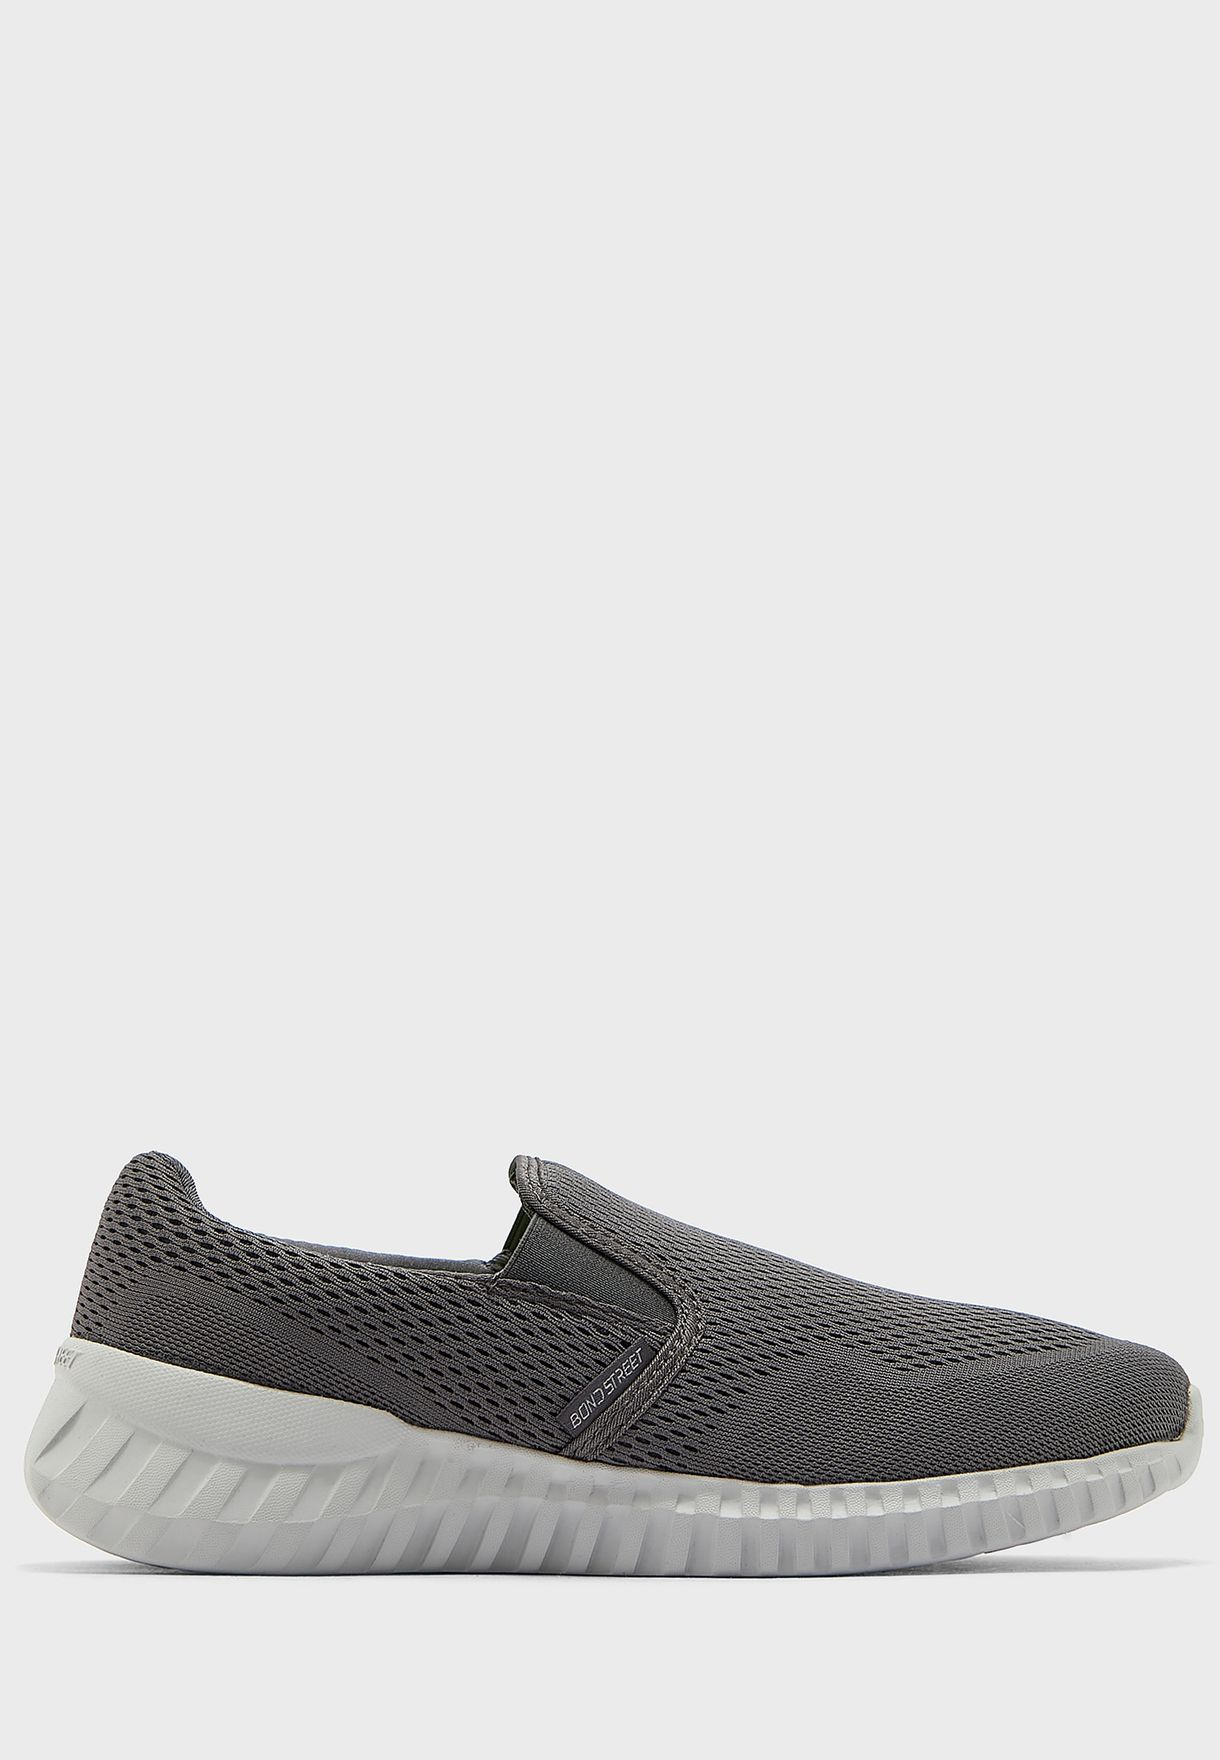 Casual Low Top Slip On Sneakers